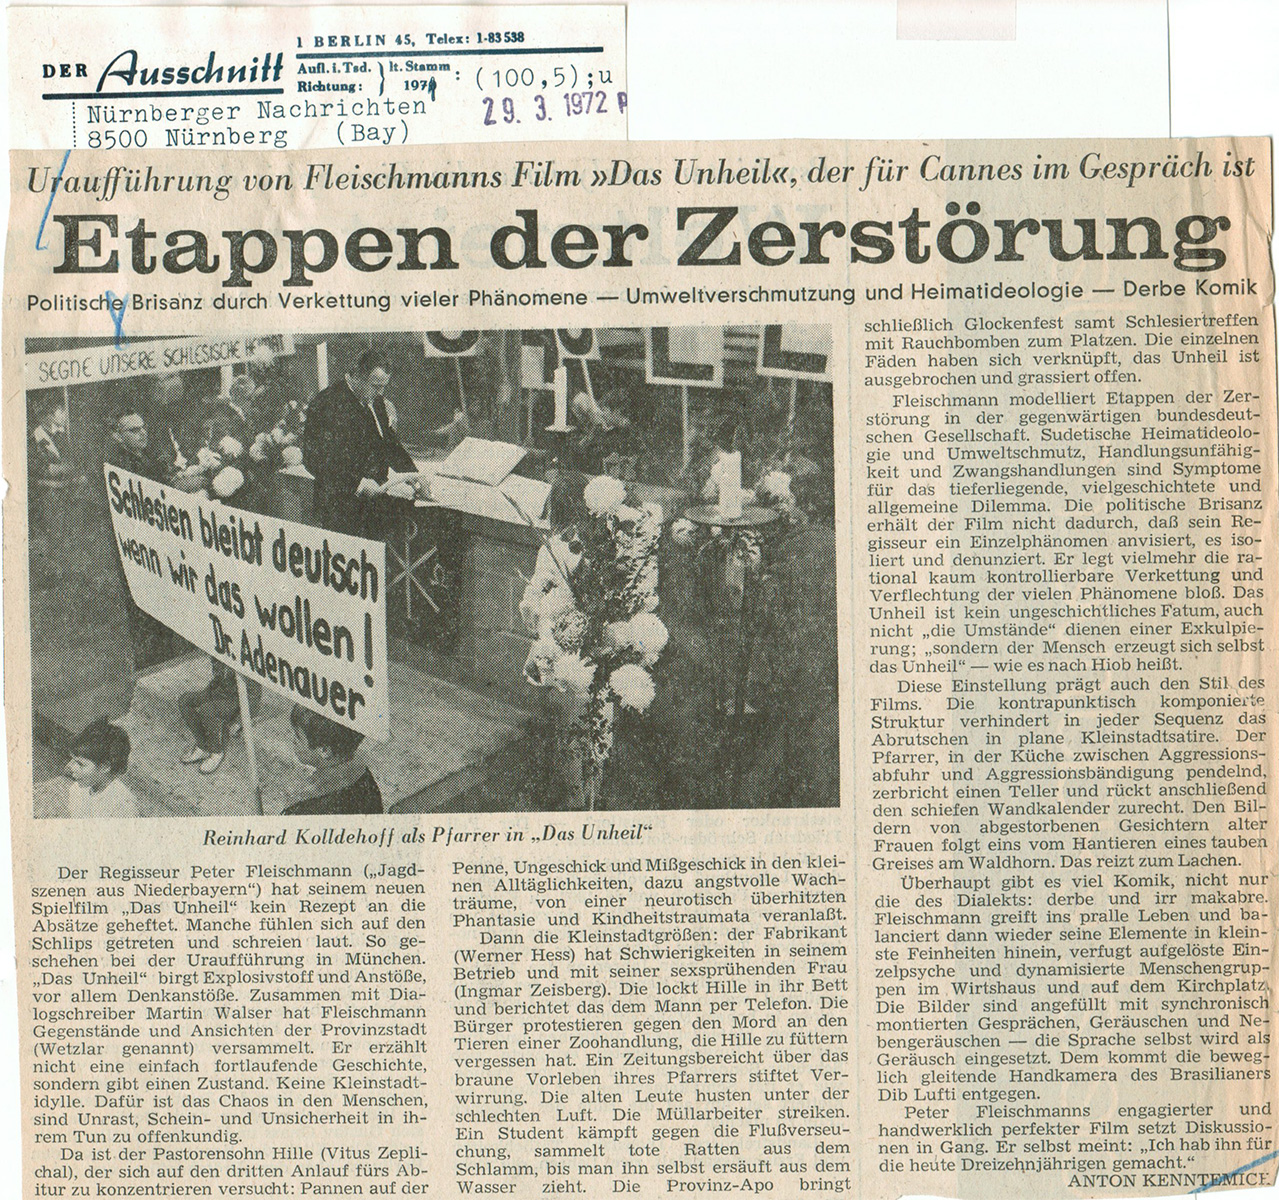 Nürnberger Nachrichten 29.03.1972